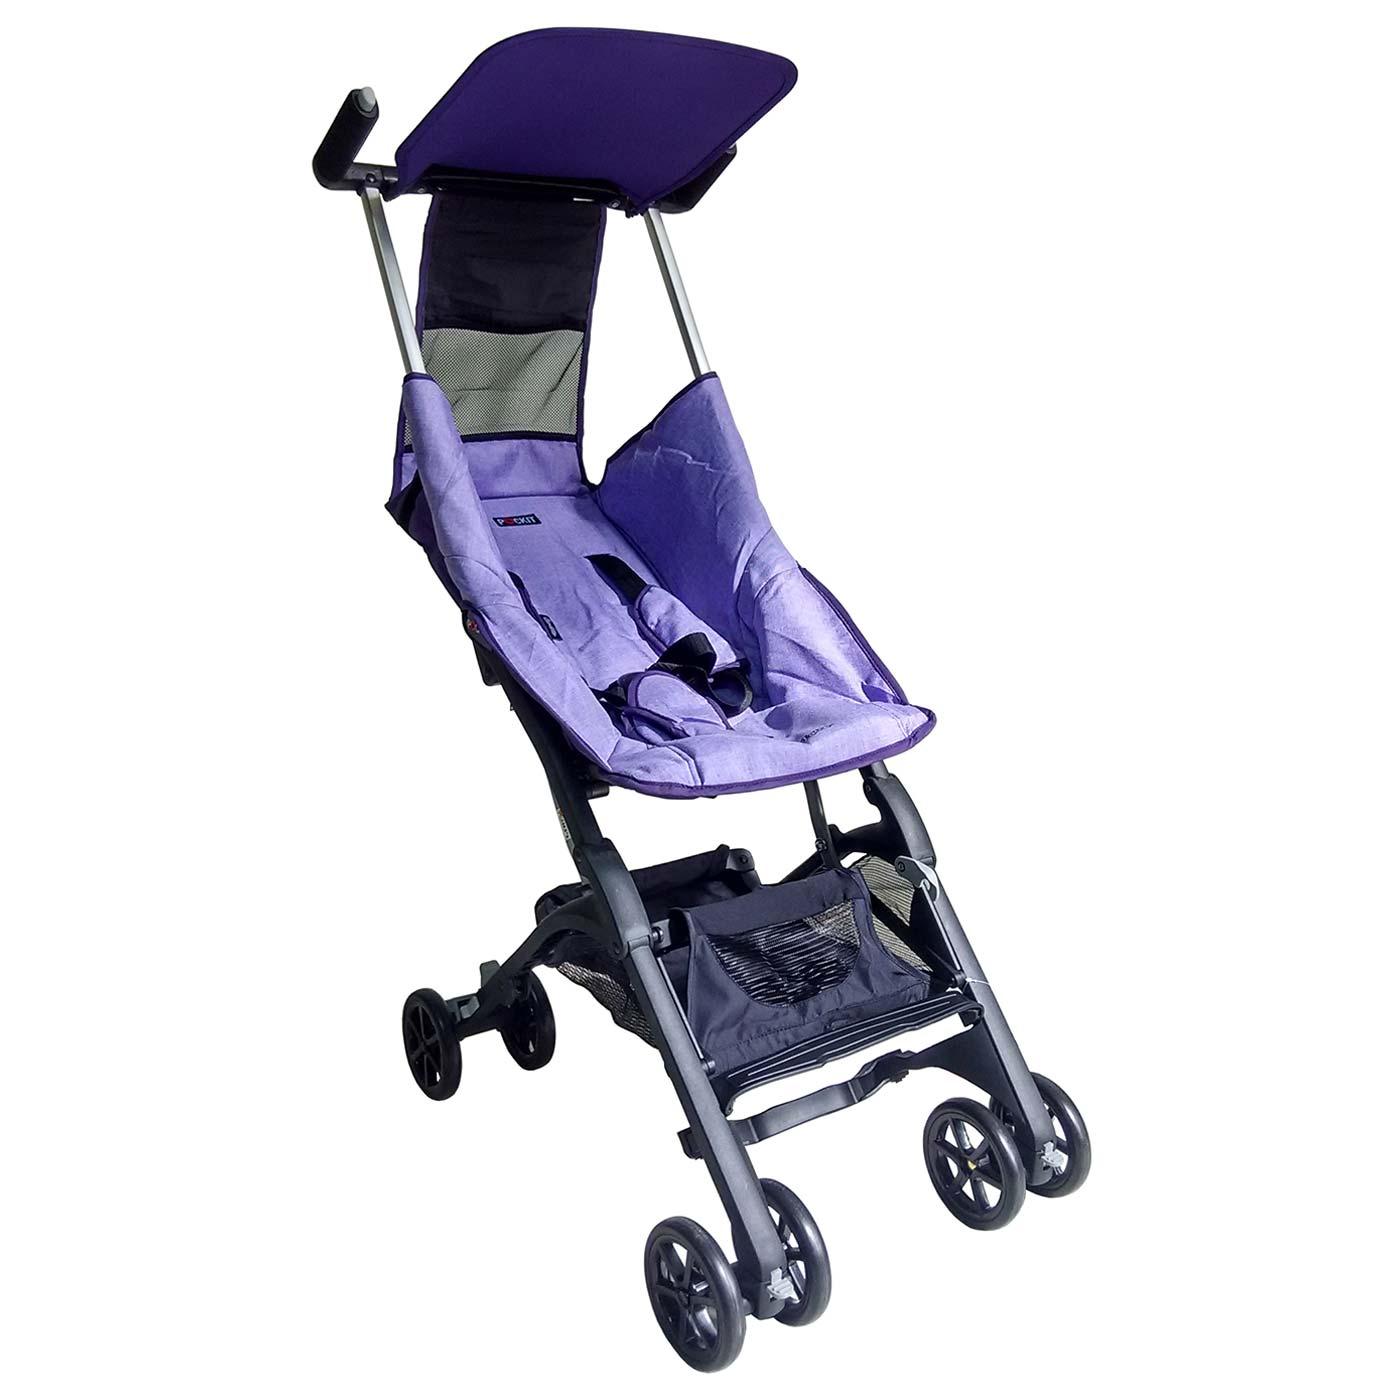 Cocolatte Stroller CL 788 Pockit Purple C